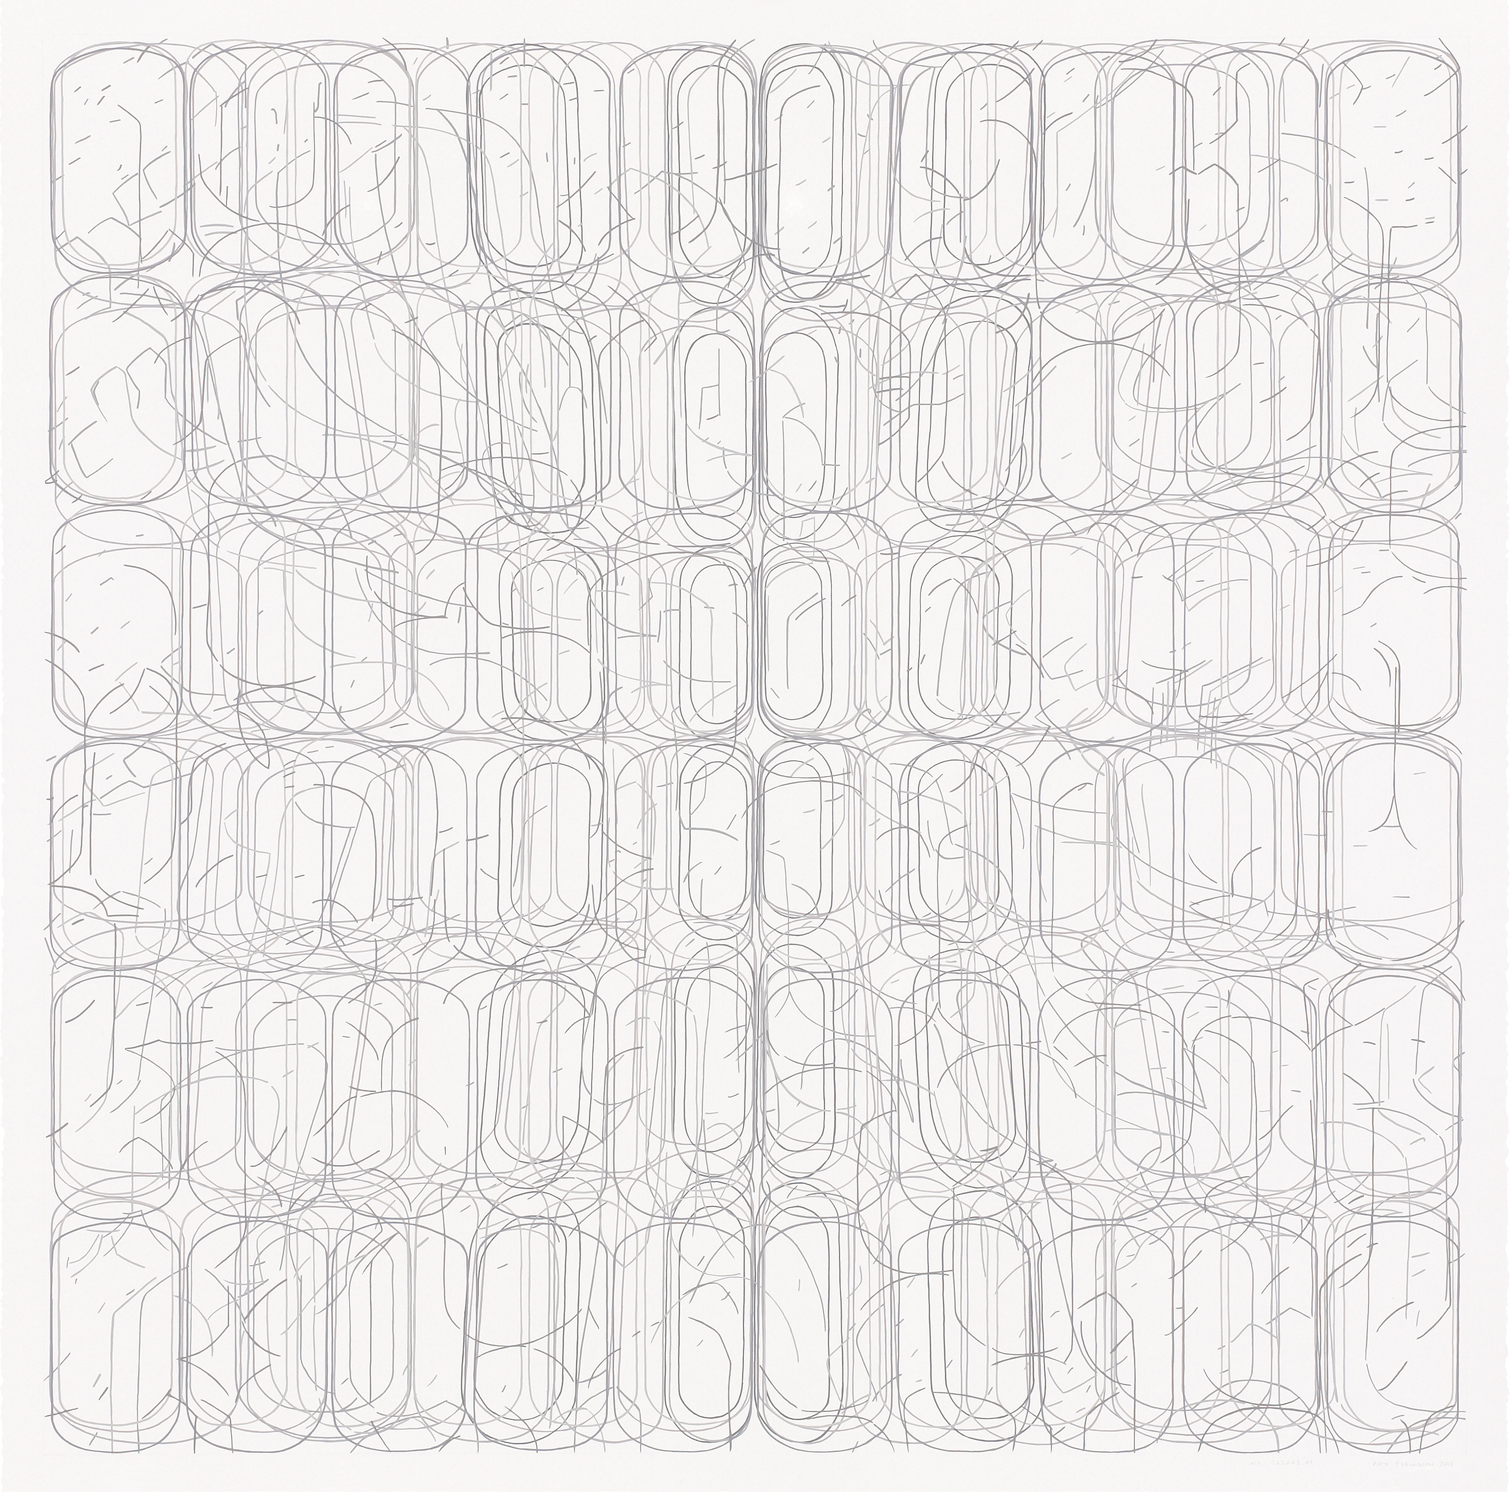 "No. 062008.01, 2008 Gouache on Rising Stonehenge paper 38"" x 38"" (41"" x 41"" framed)"